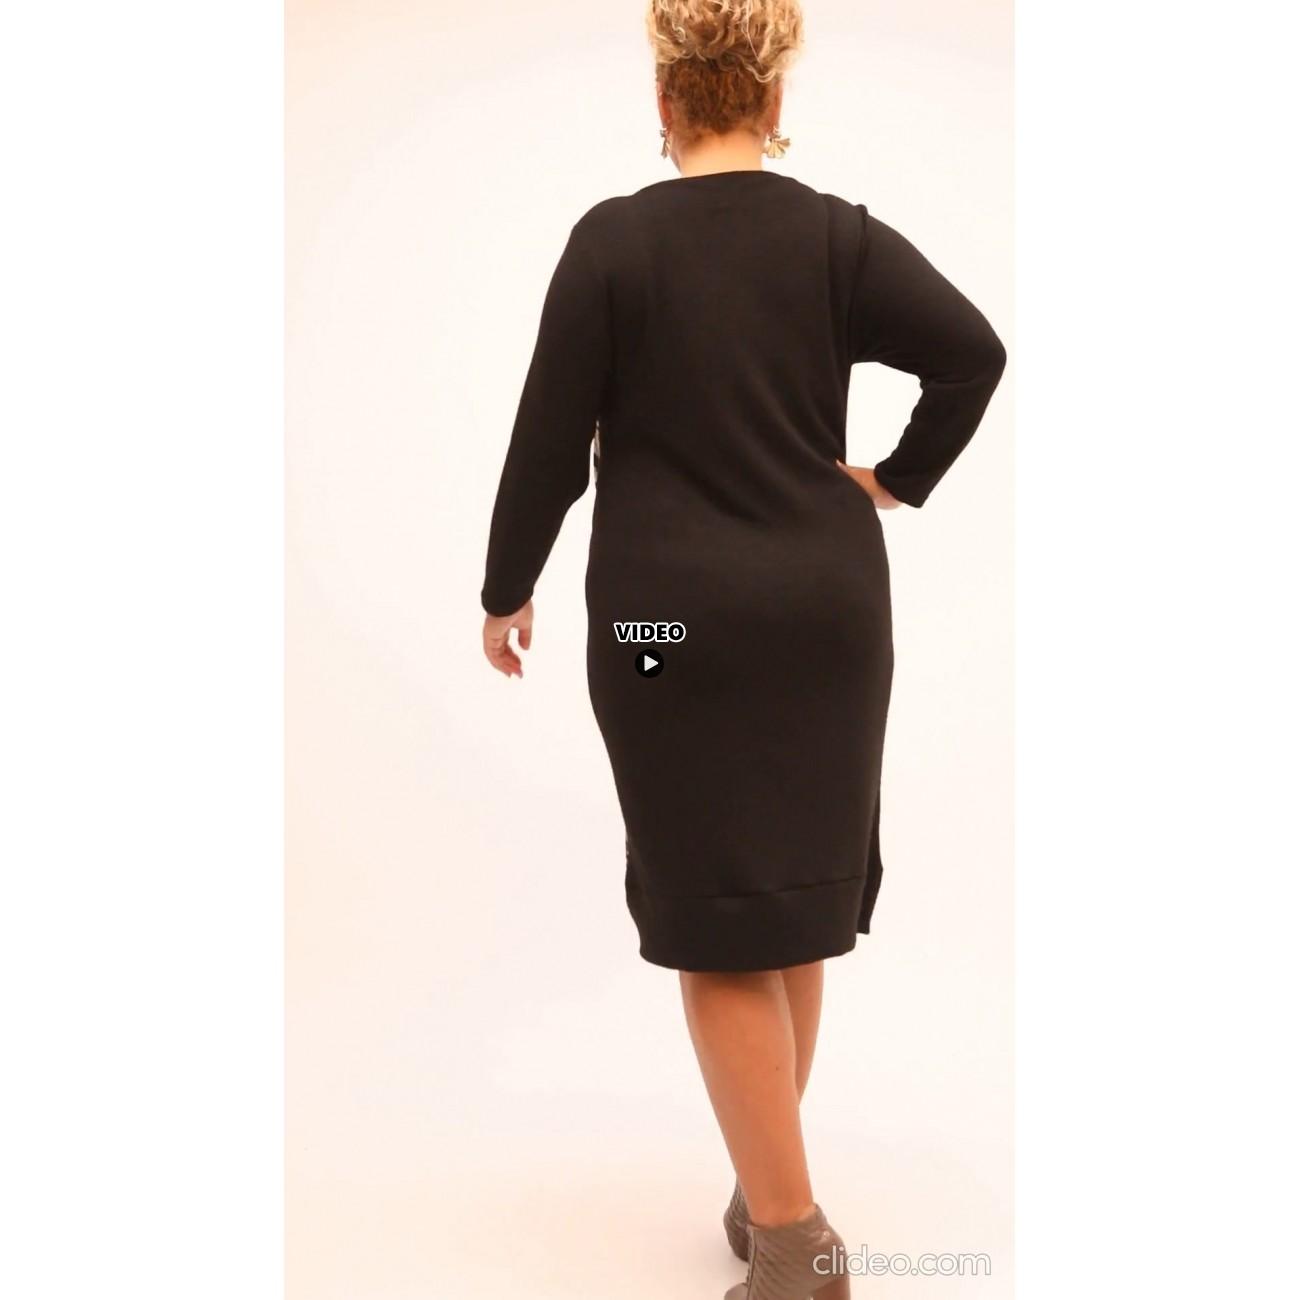 B21-6400U Classic dress with pattern